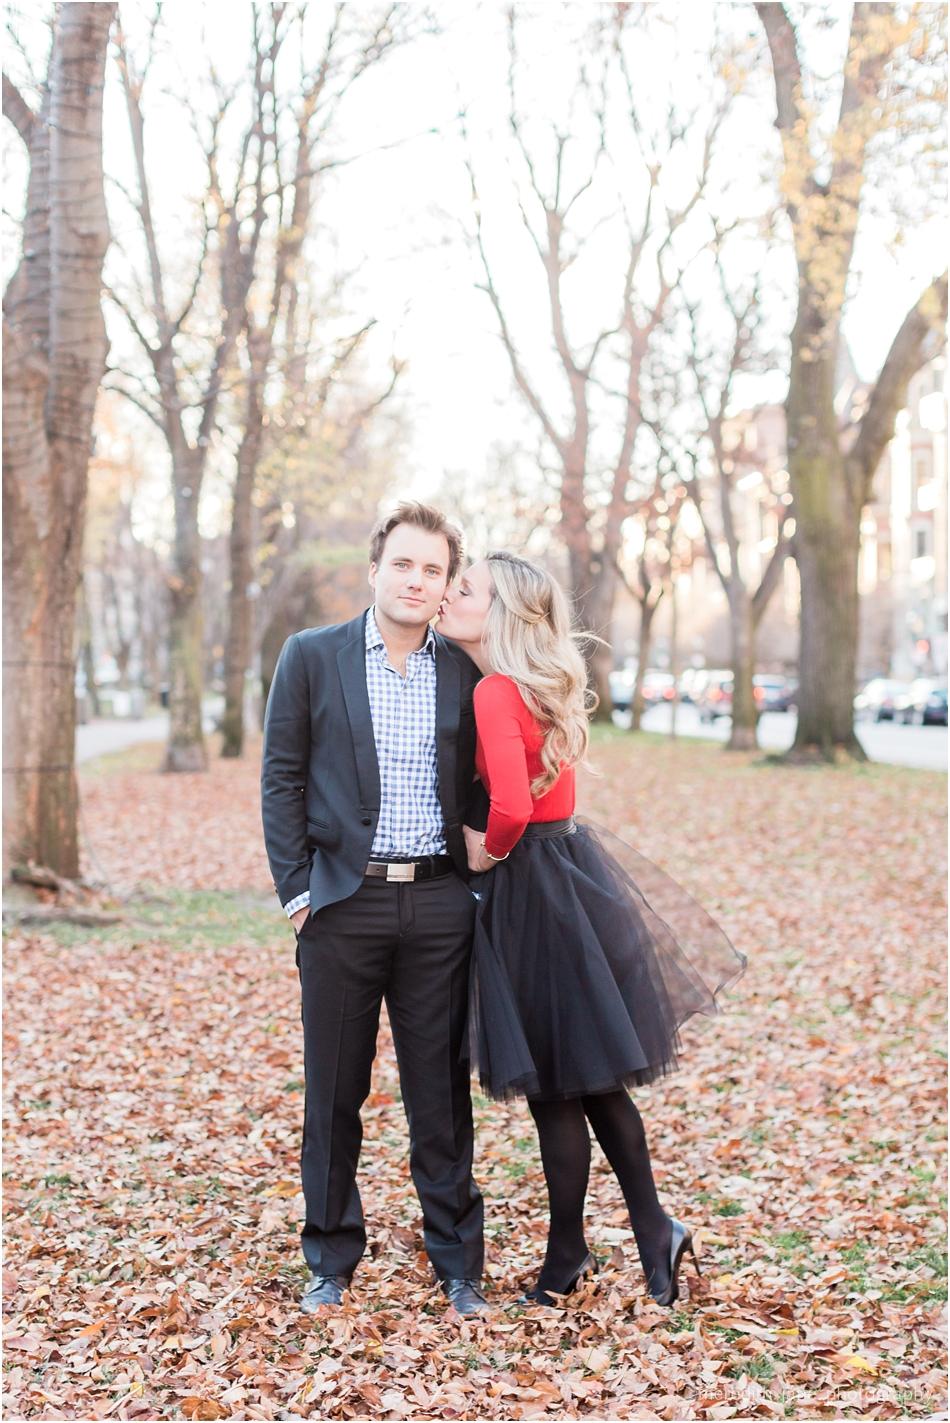 holiday_boston_massachusetts_engagement_commonwealth_ave_fall_foliage_cape_cod_wedding_photographer_Meredith_Jane_Photography_photo_0990.jpg